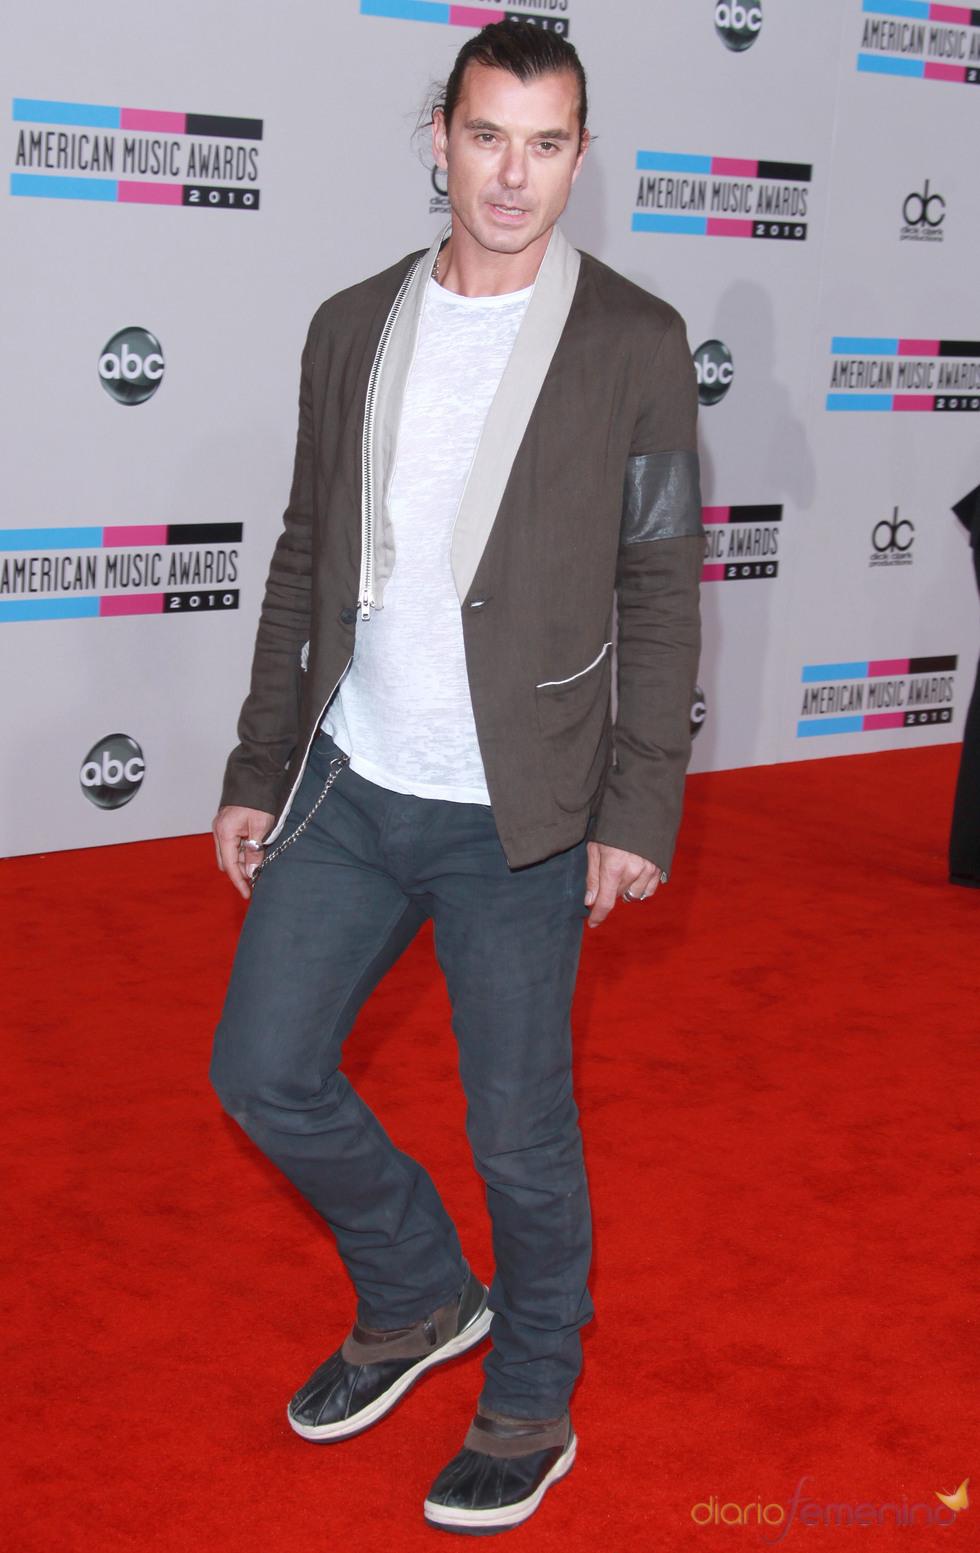 Gavin Rossdale en los American Music Awards 2010